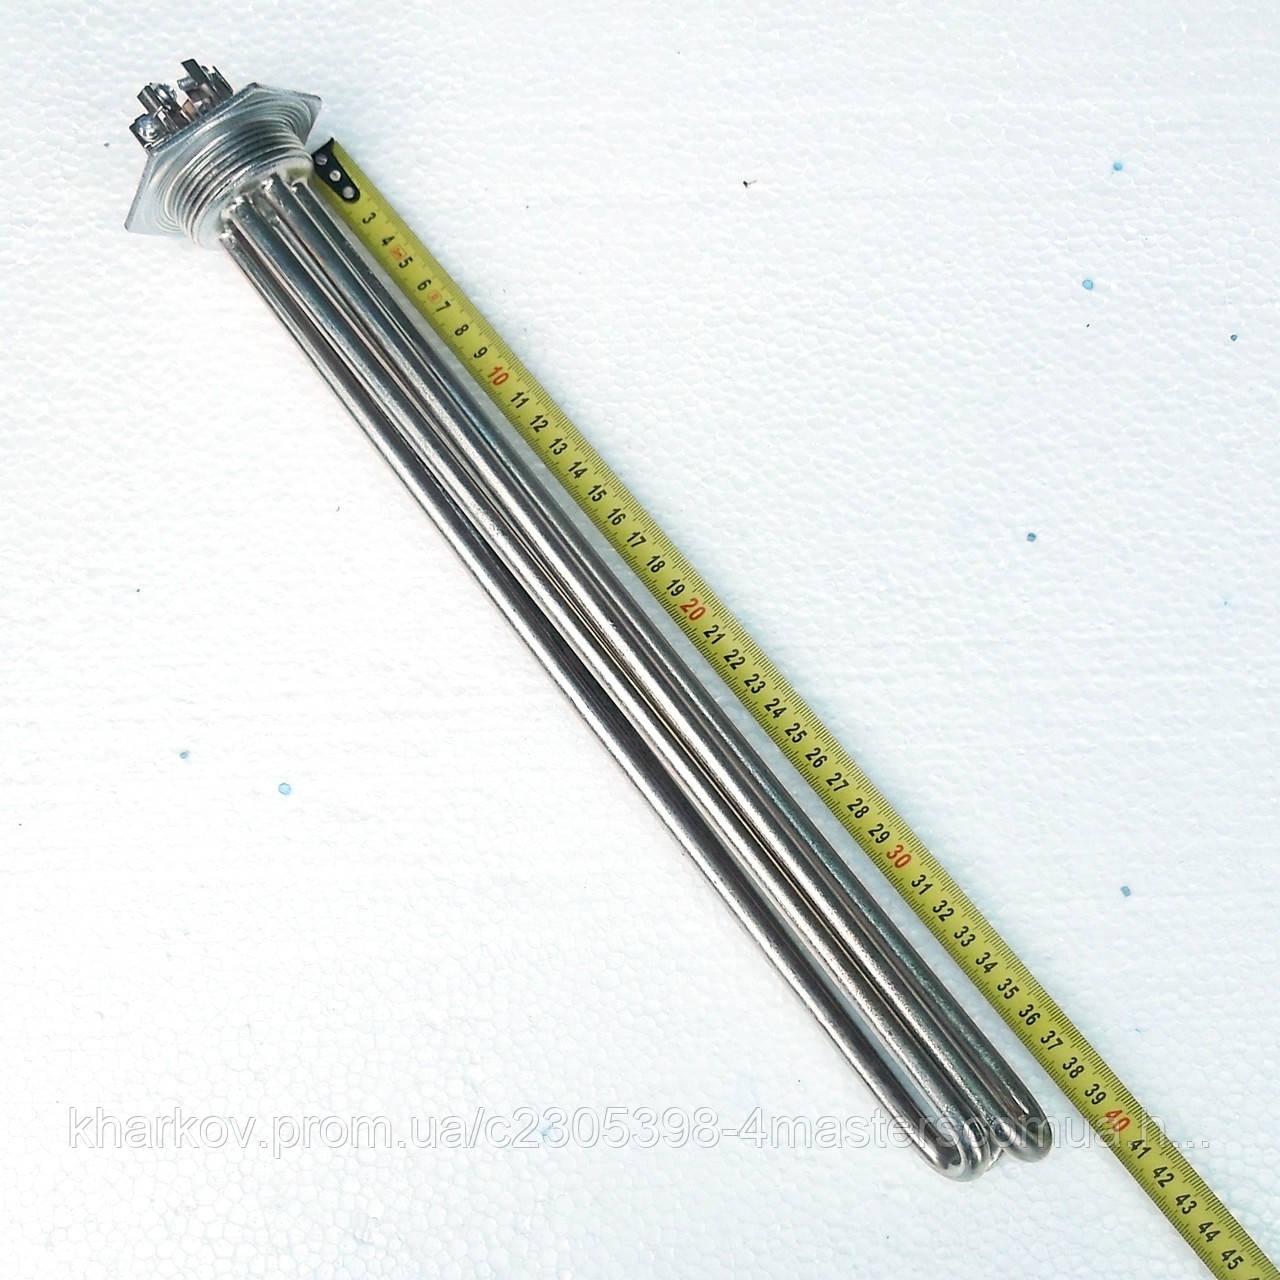 "ТЭН блок 6000 Вт 1,5"" (47,2мм) для электрокотлов"